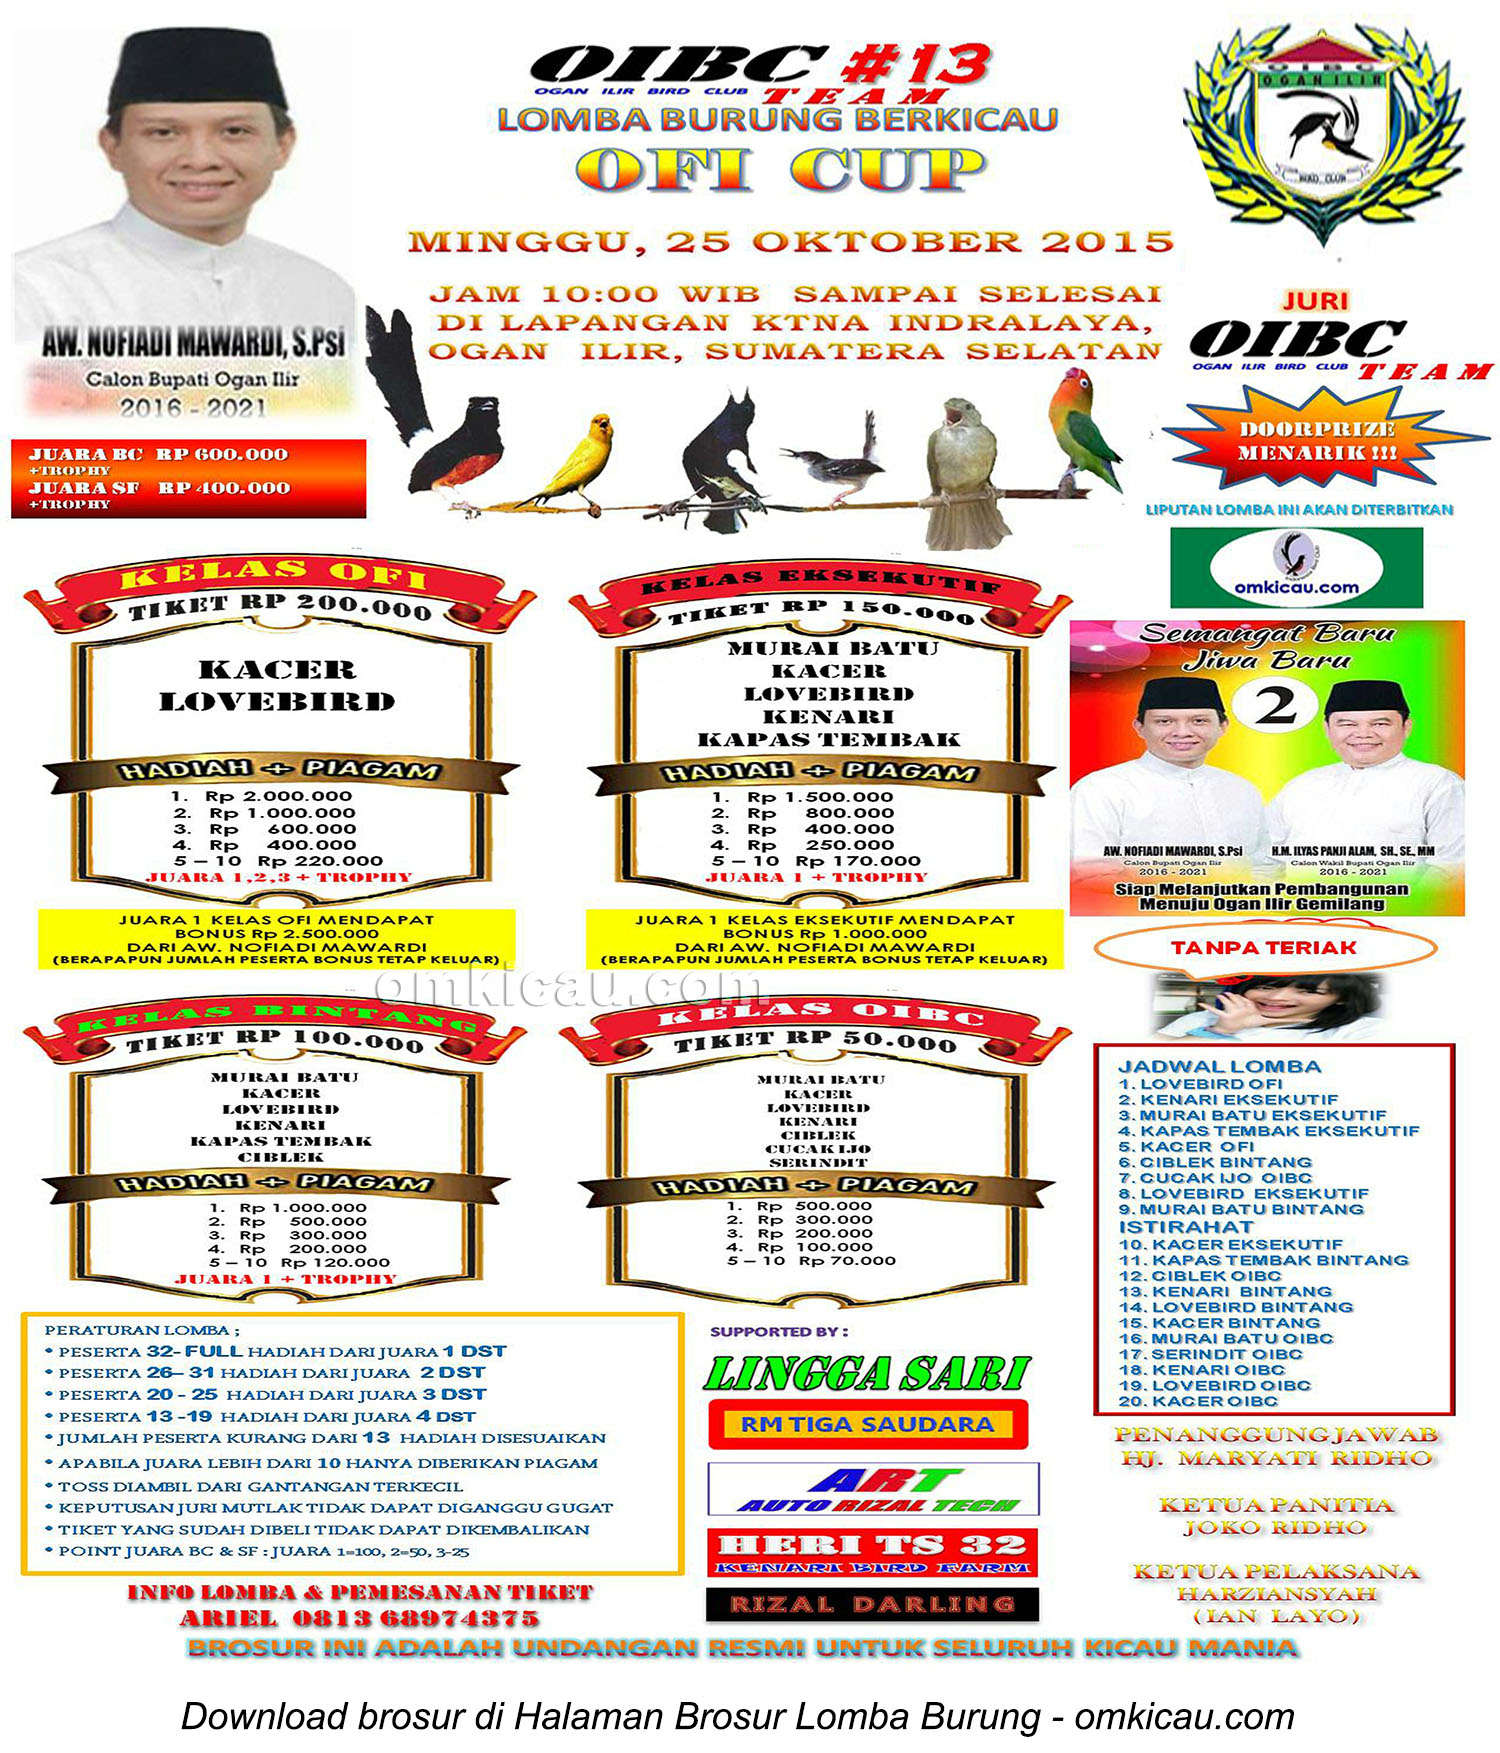 Brosur Lomba Burung Berkicau Ofi Cup - OIBC #13, Ogan Ilir, 25 Oktober 2015